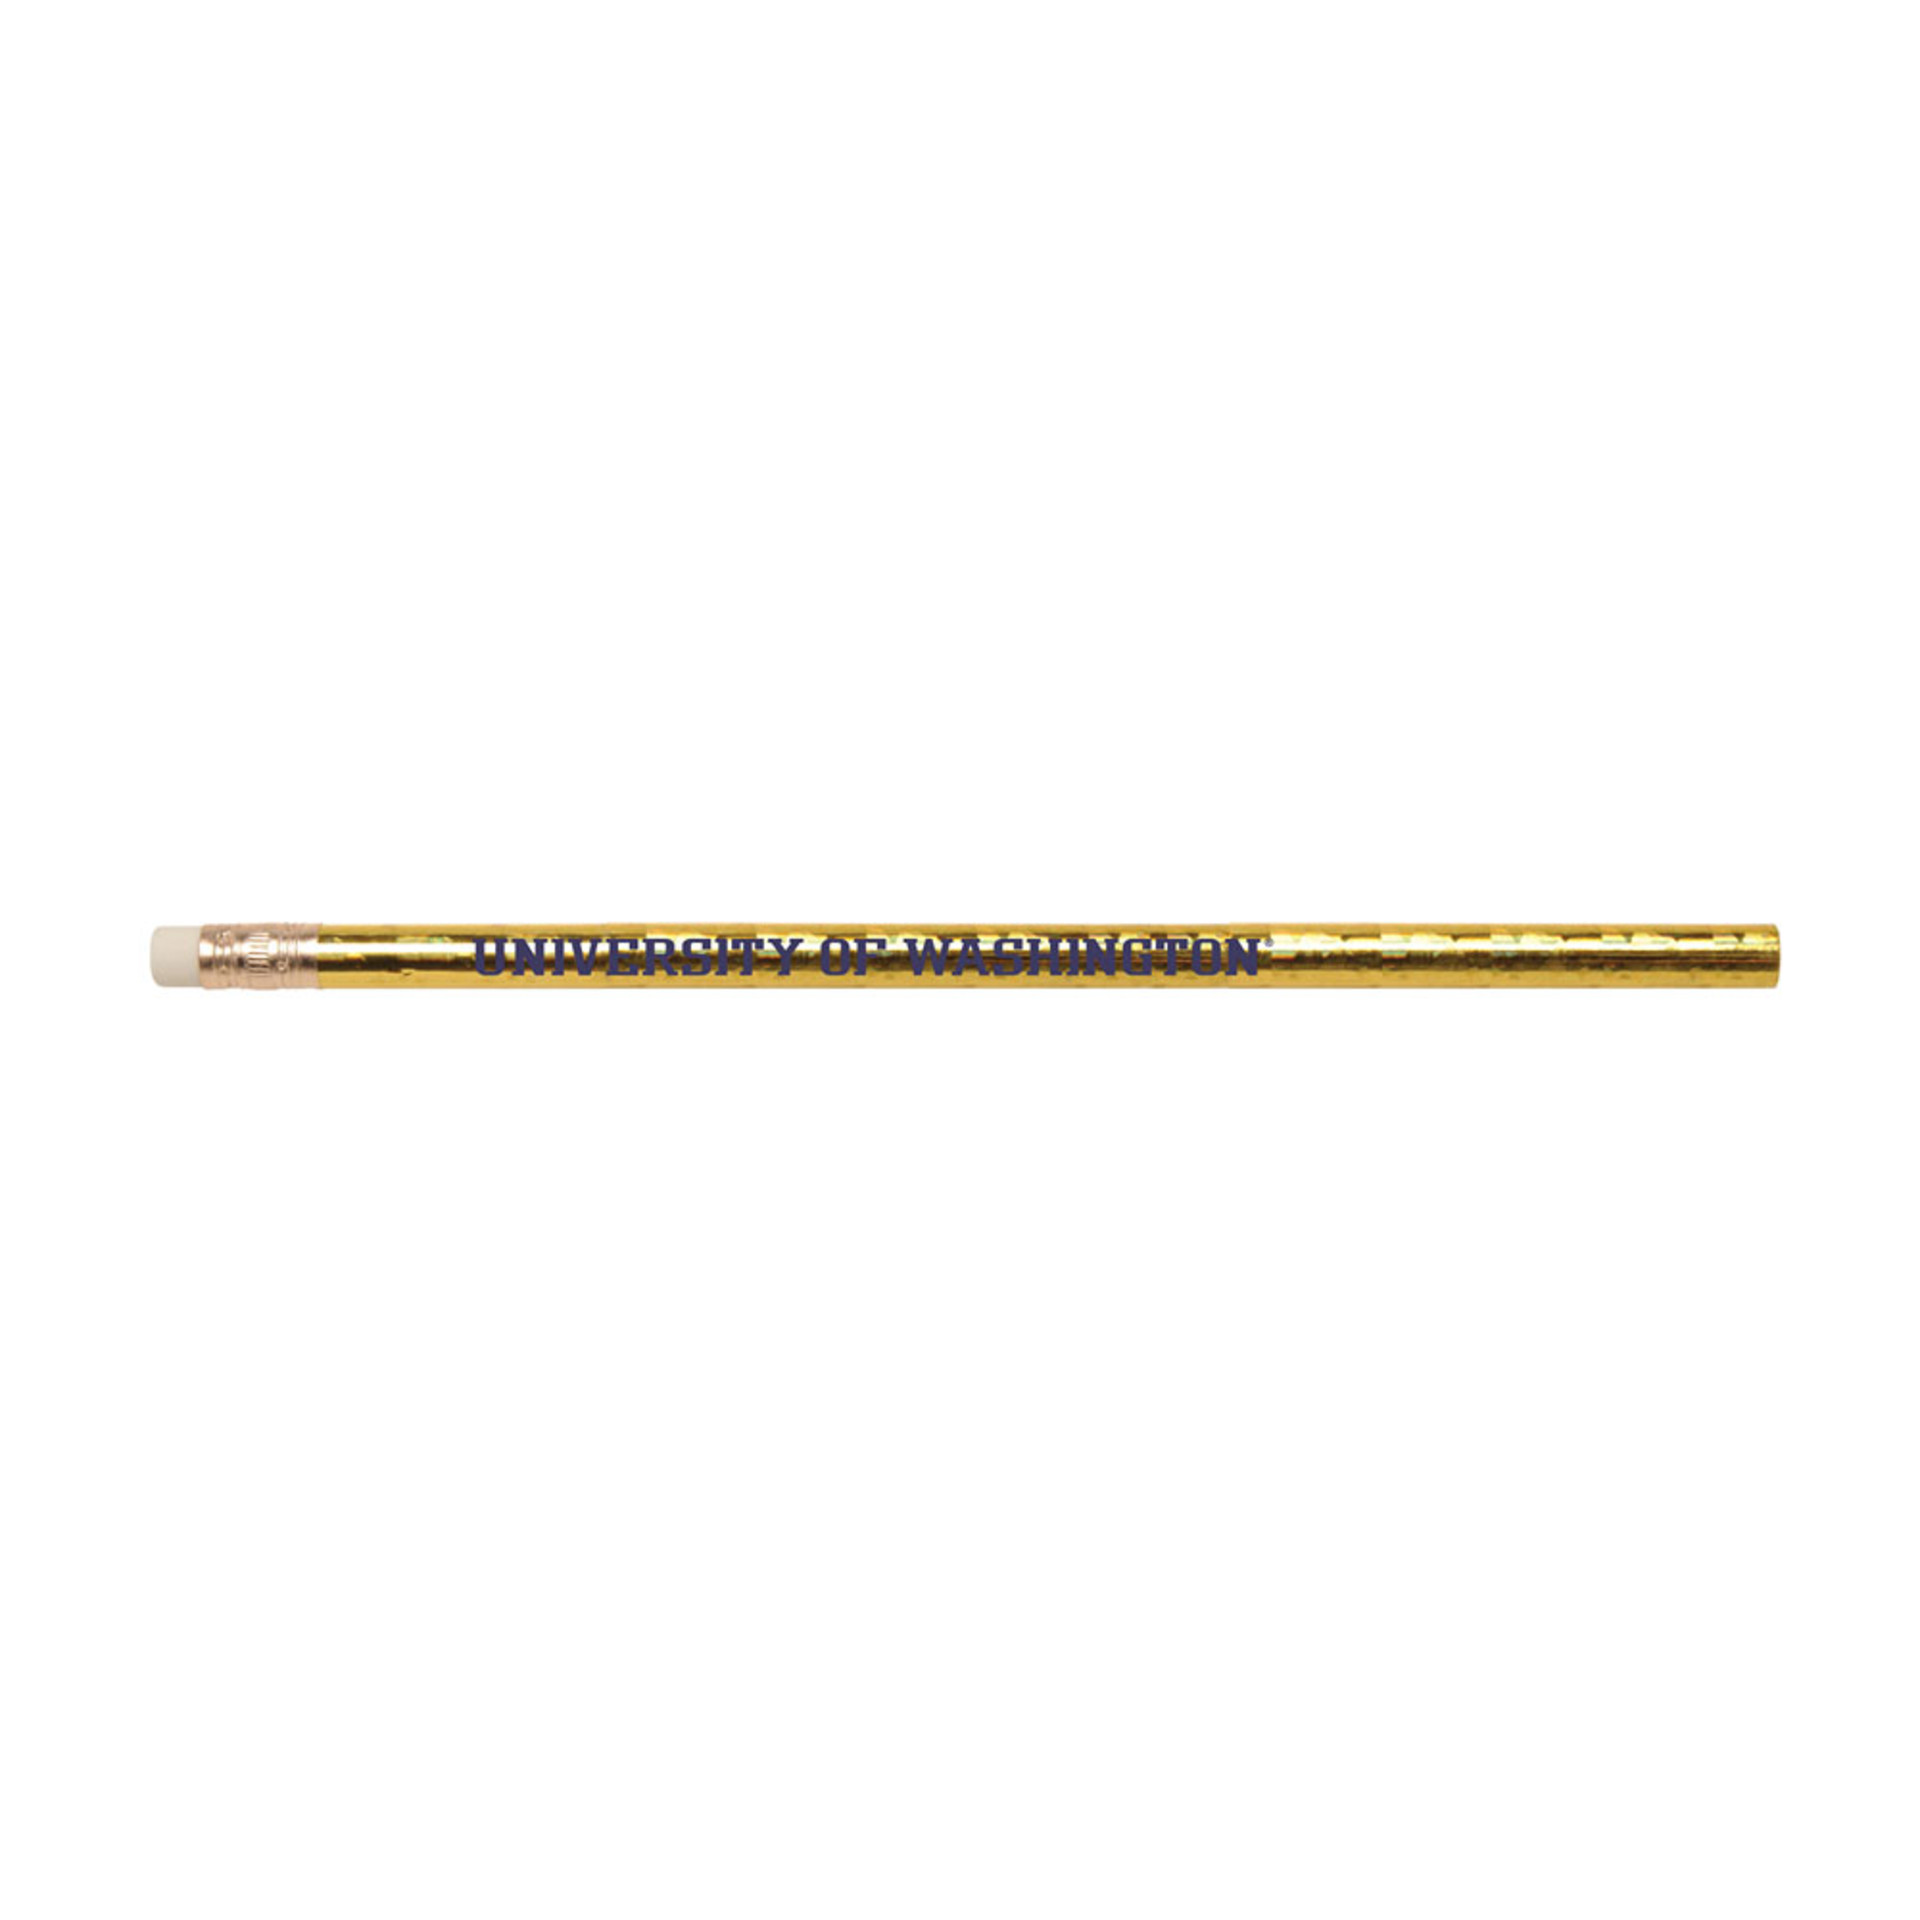 Gold Prismatic Foil U of W Pencil